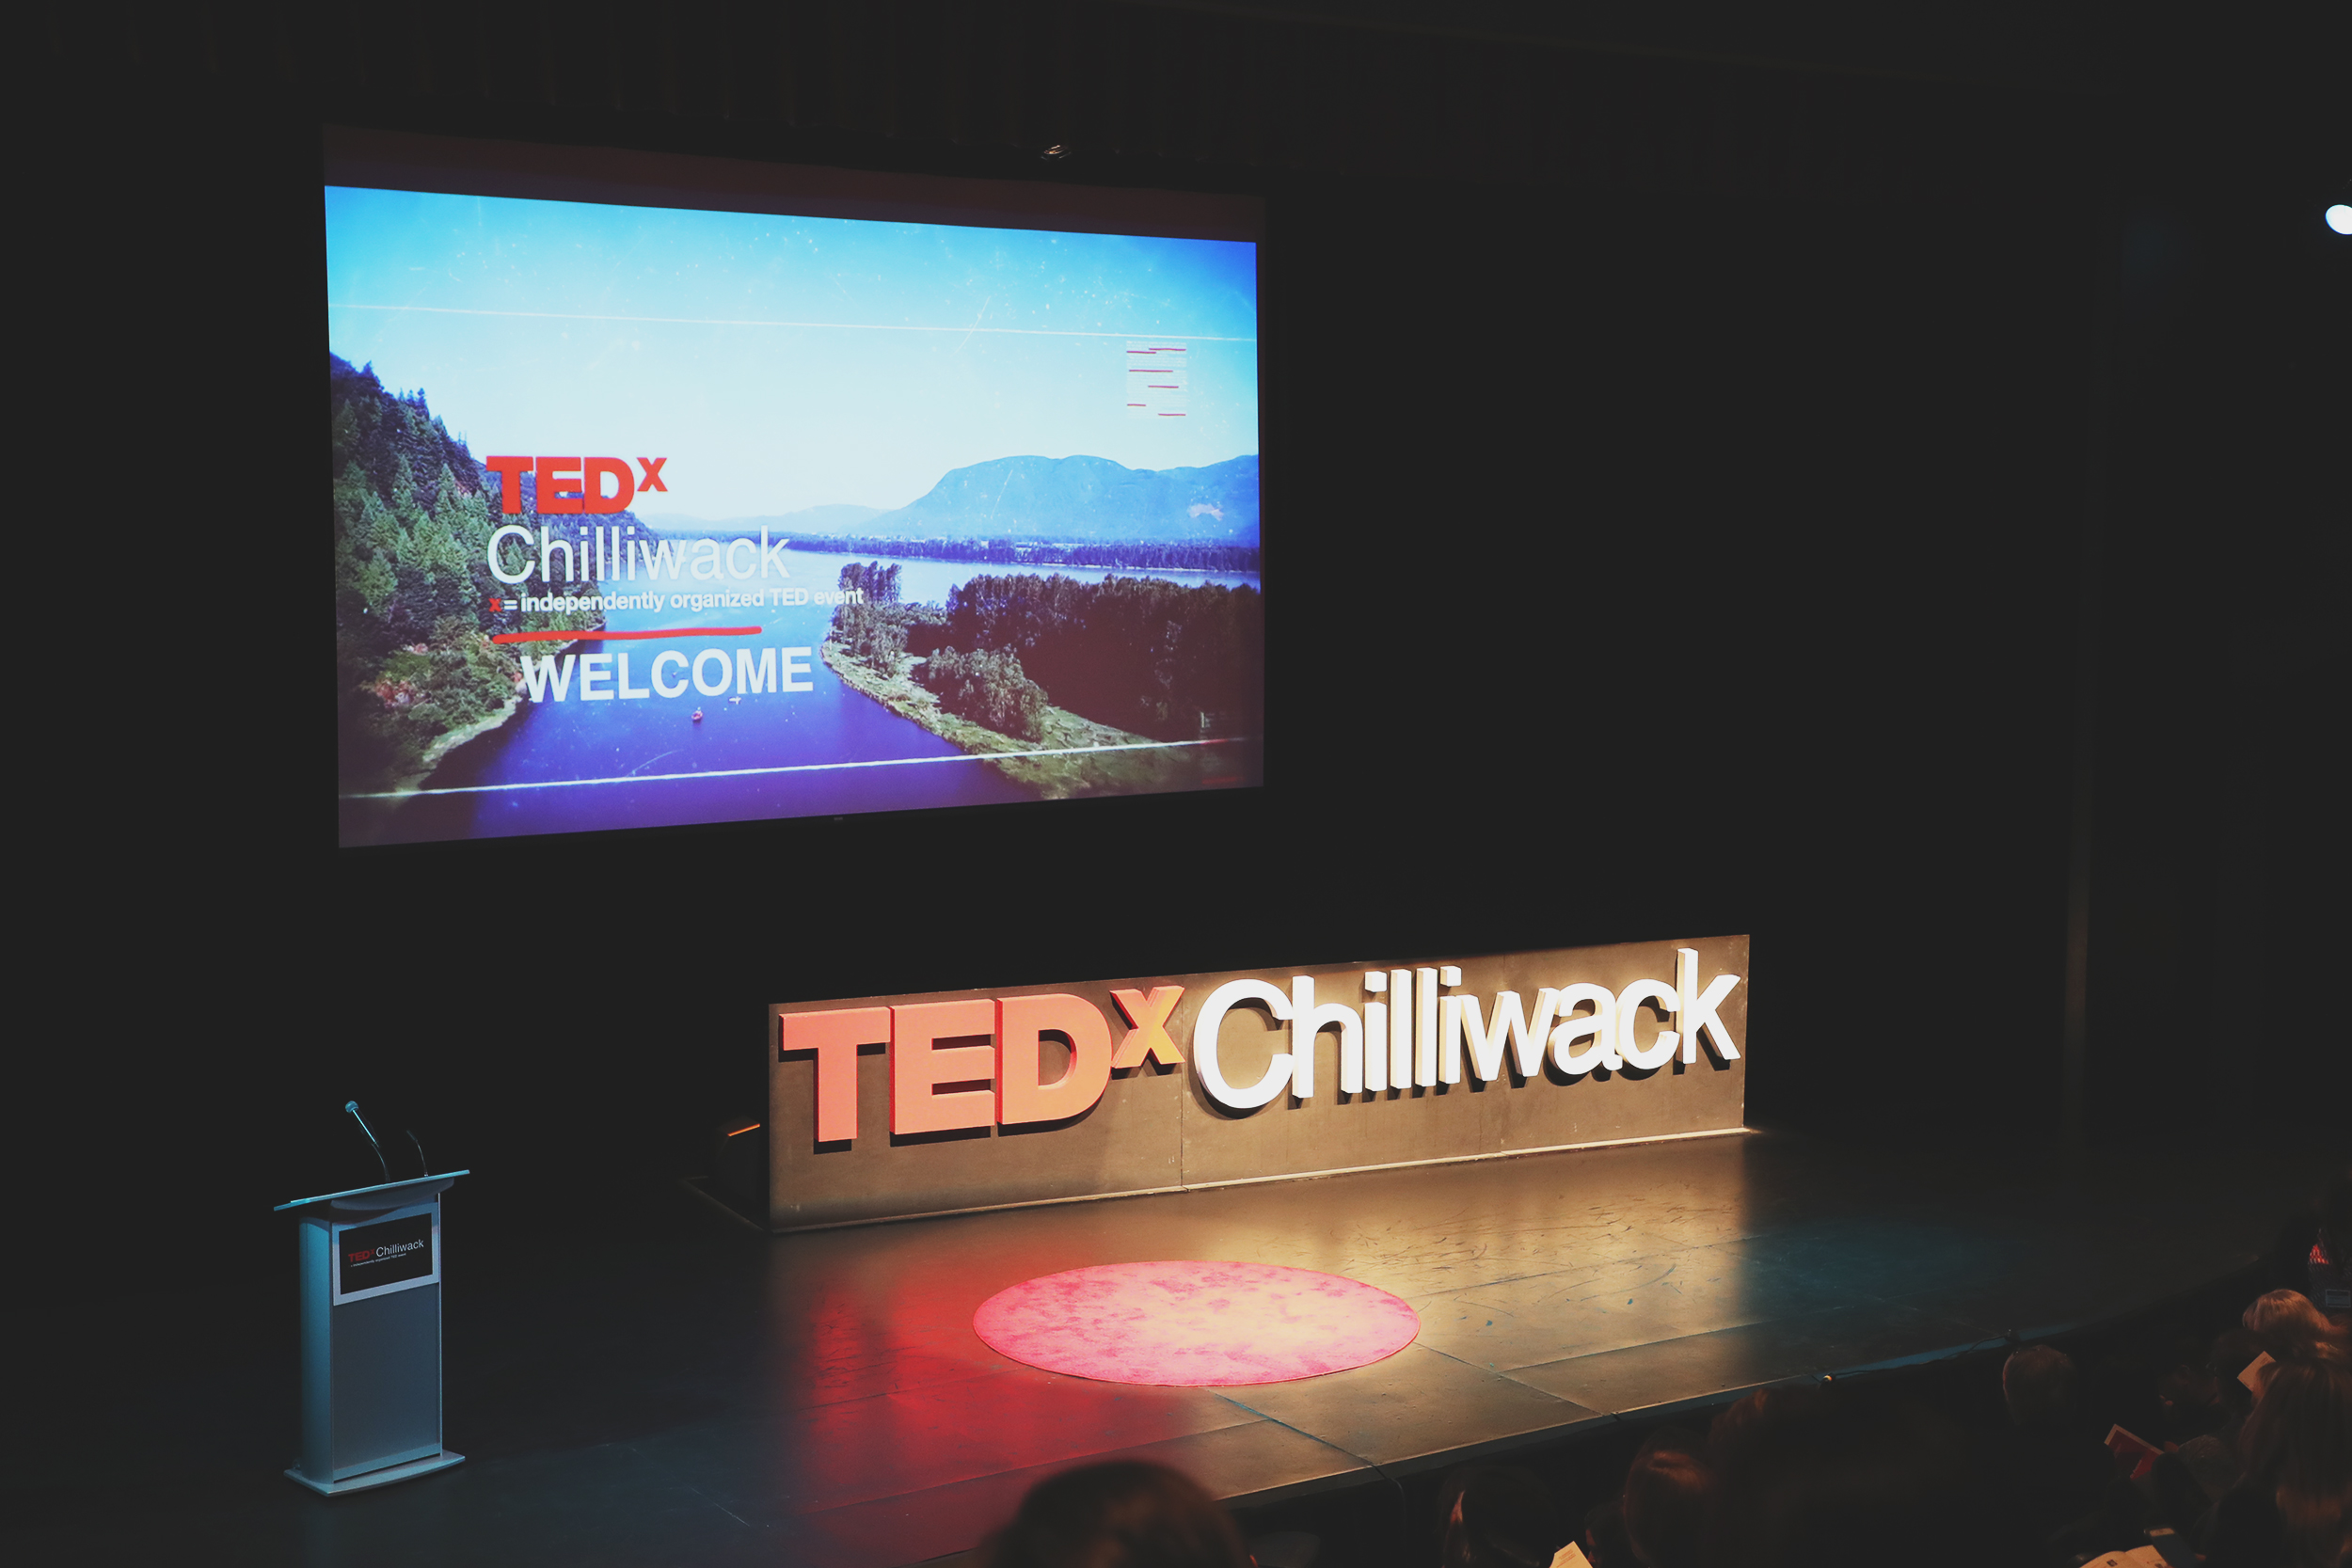 TEDX_09.jpg